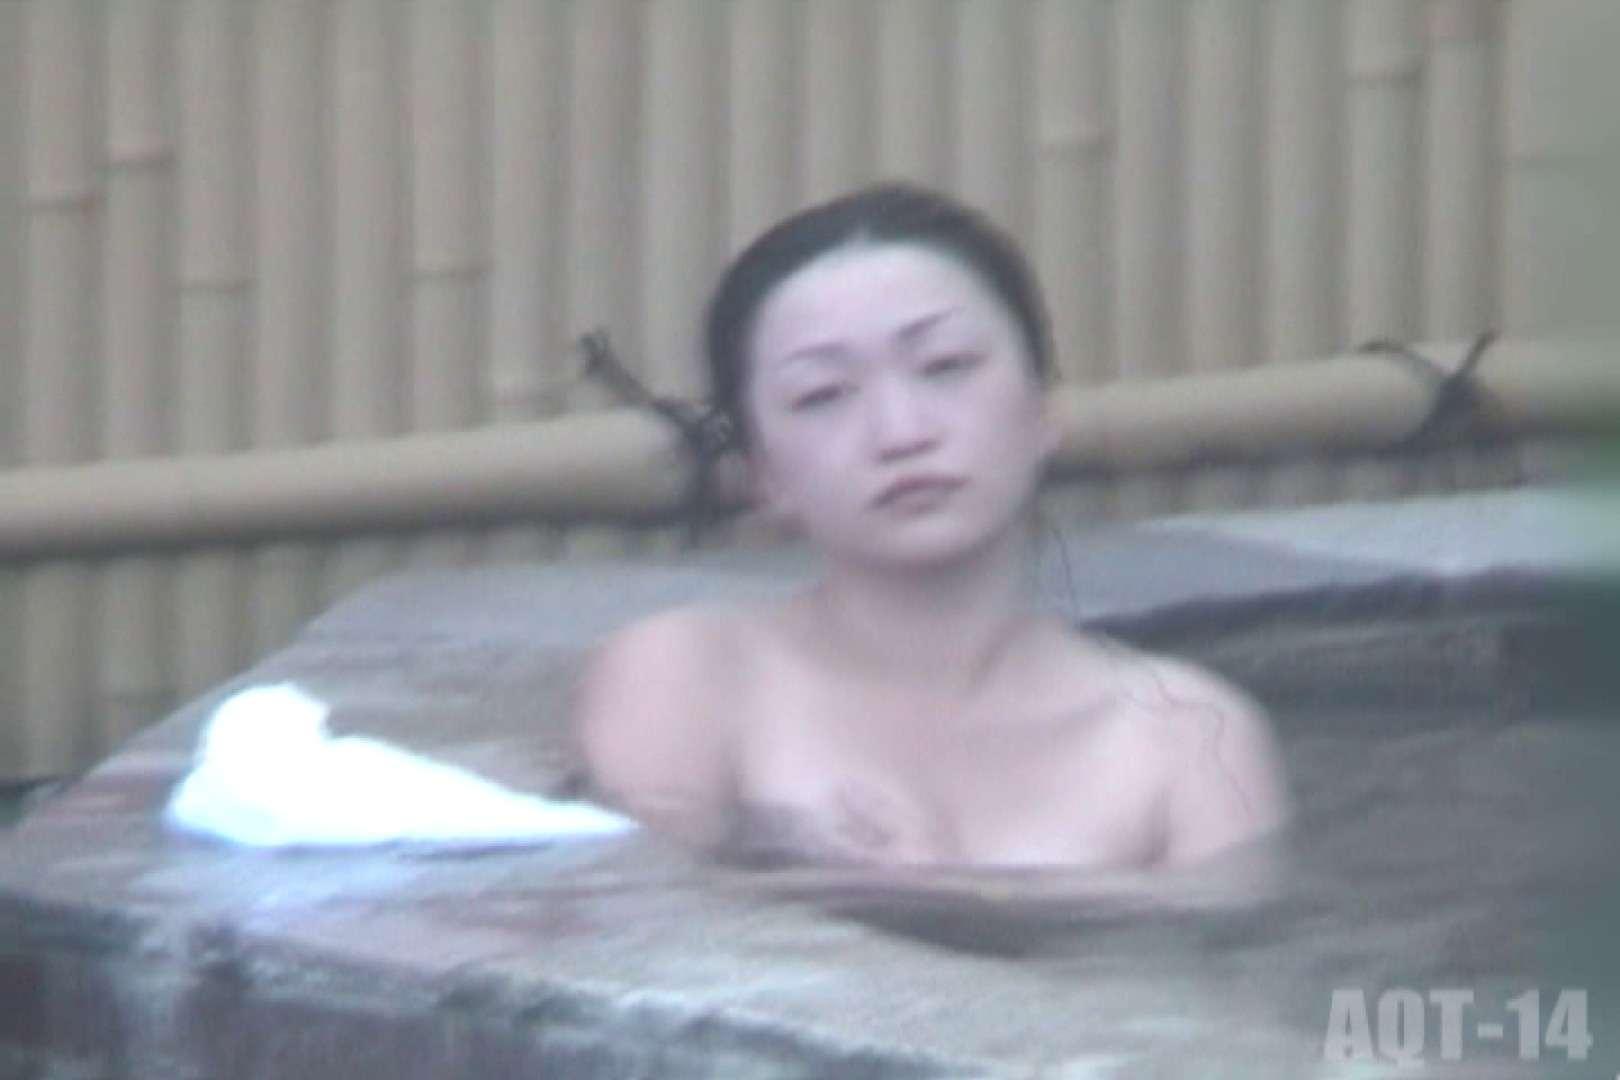 Aquaな露天風呂Vol.826 盗撮 | OLエロ画像  88PICs 4